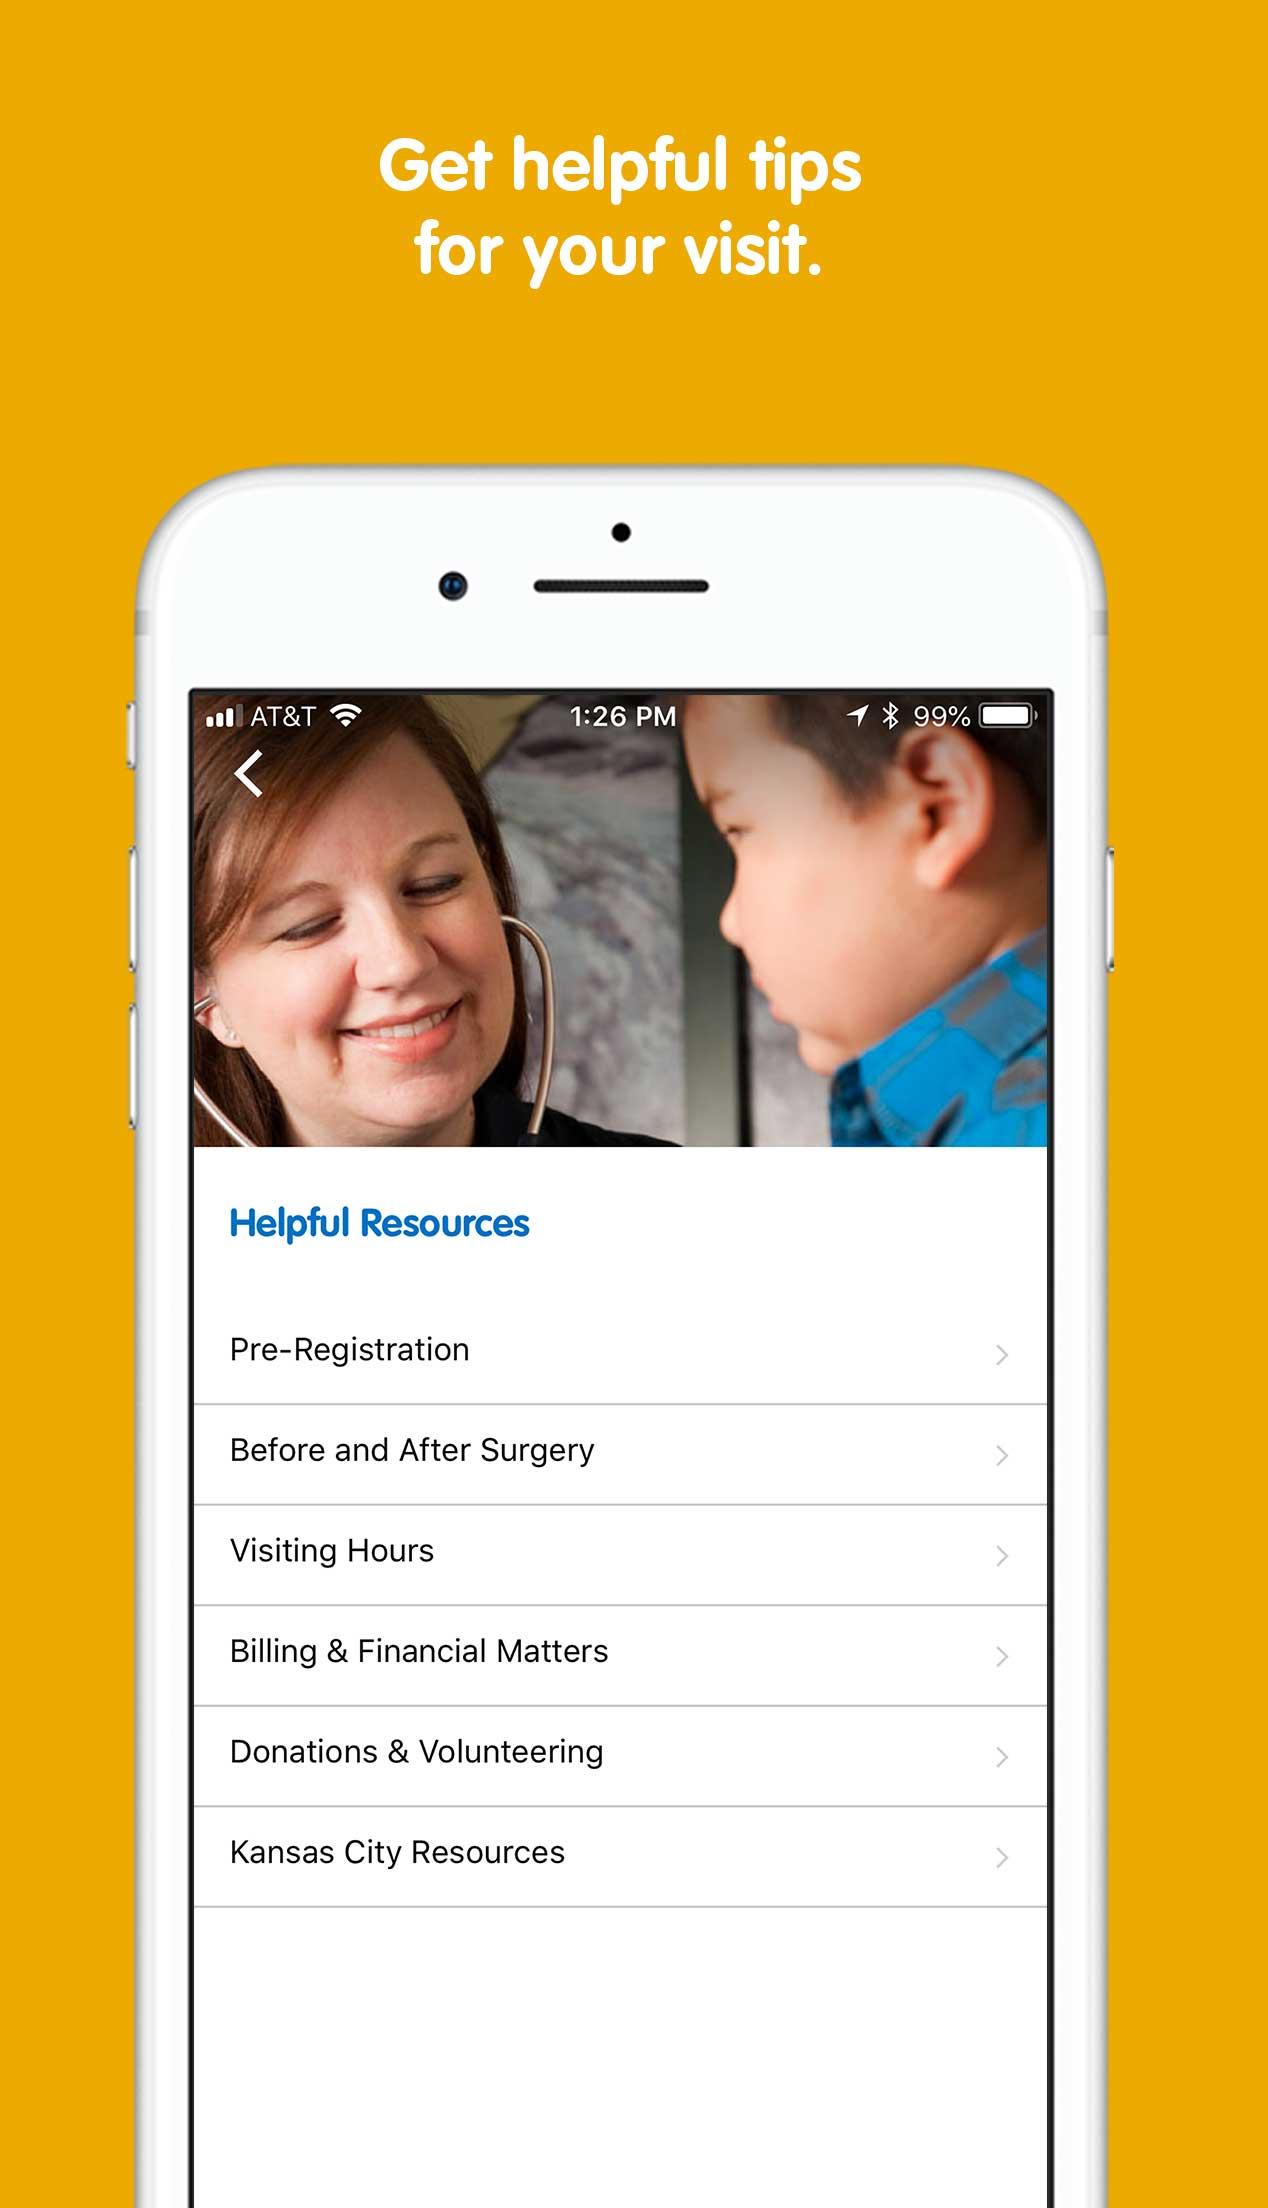 Children's Mercy Helpful Resources screen